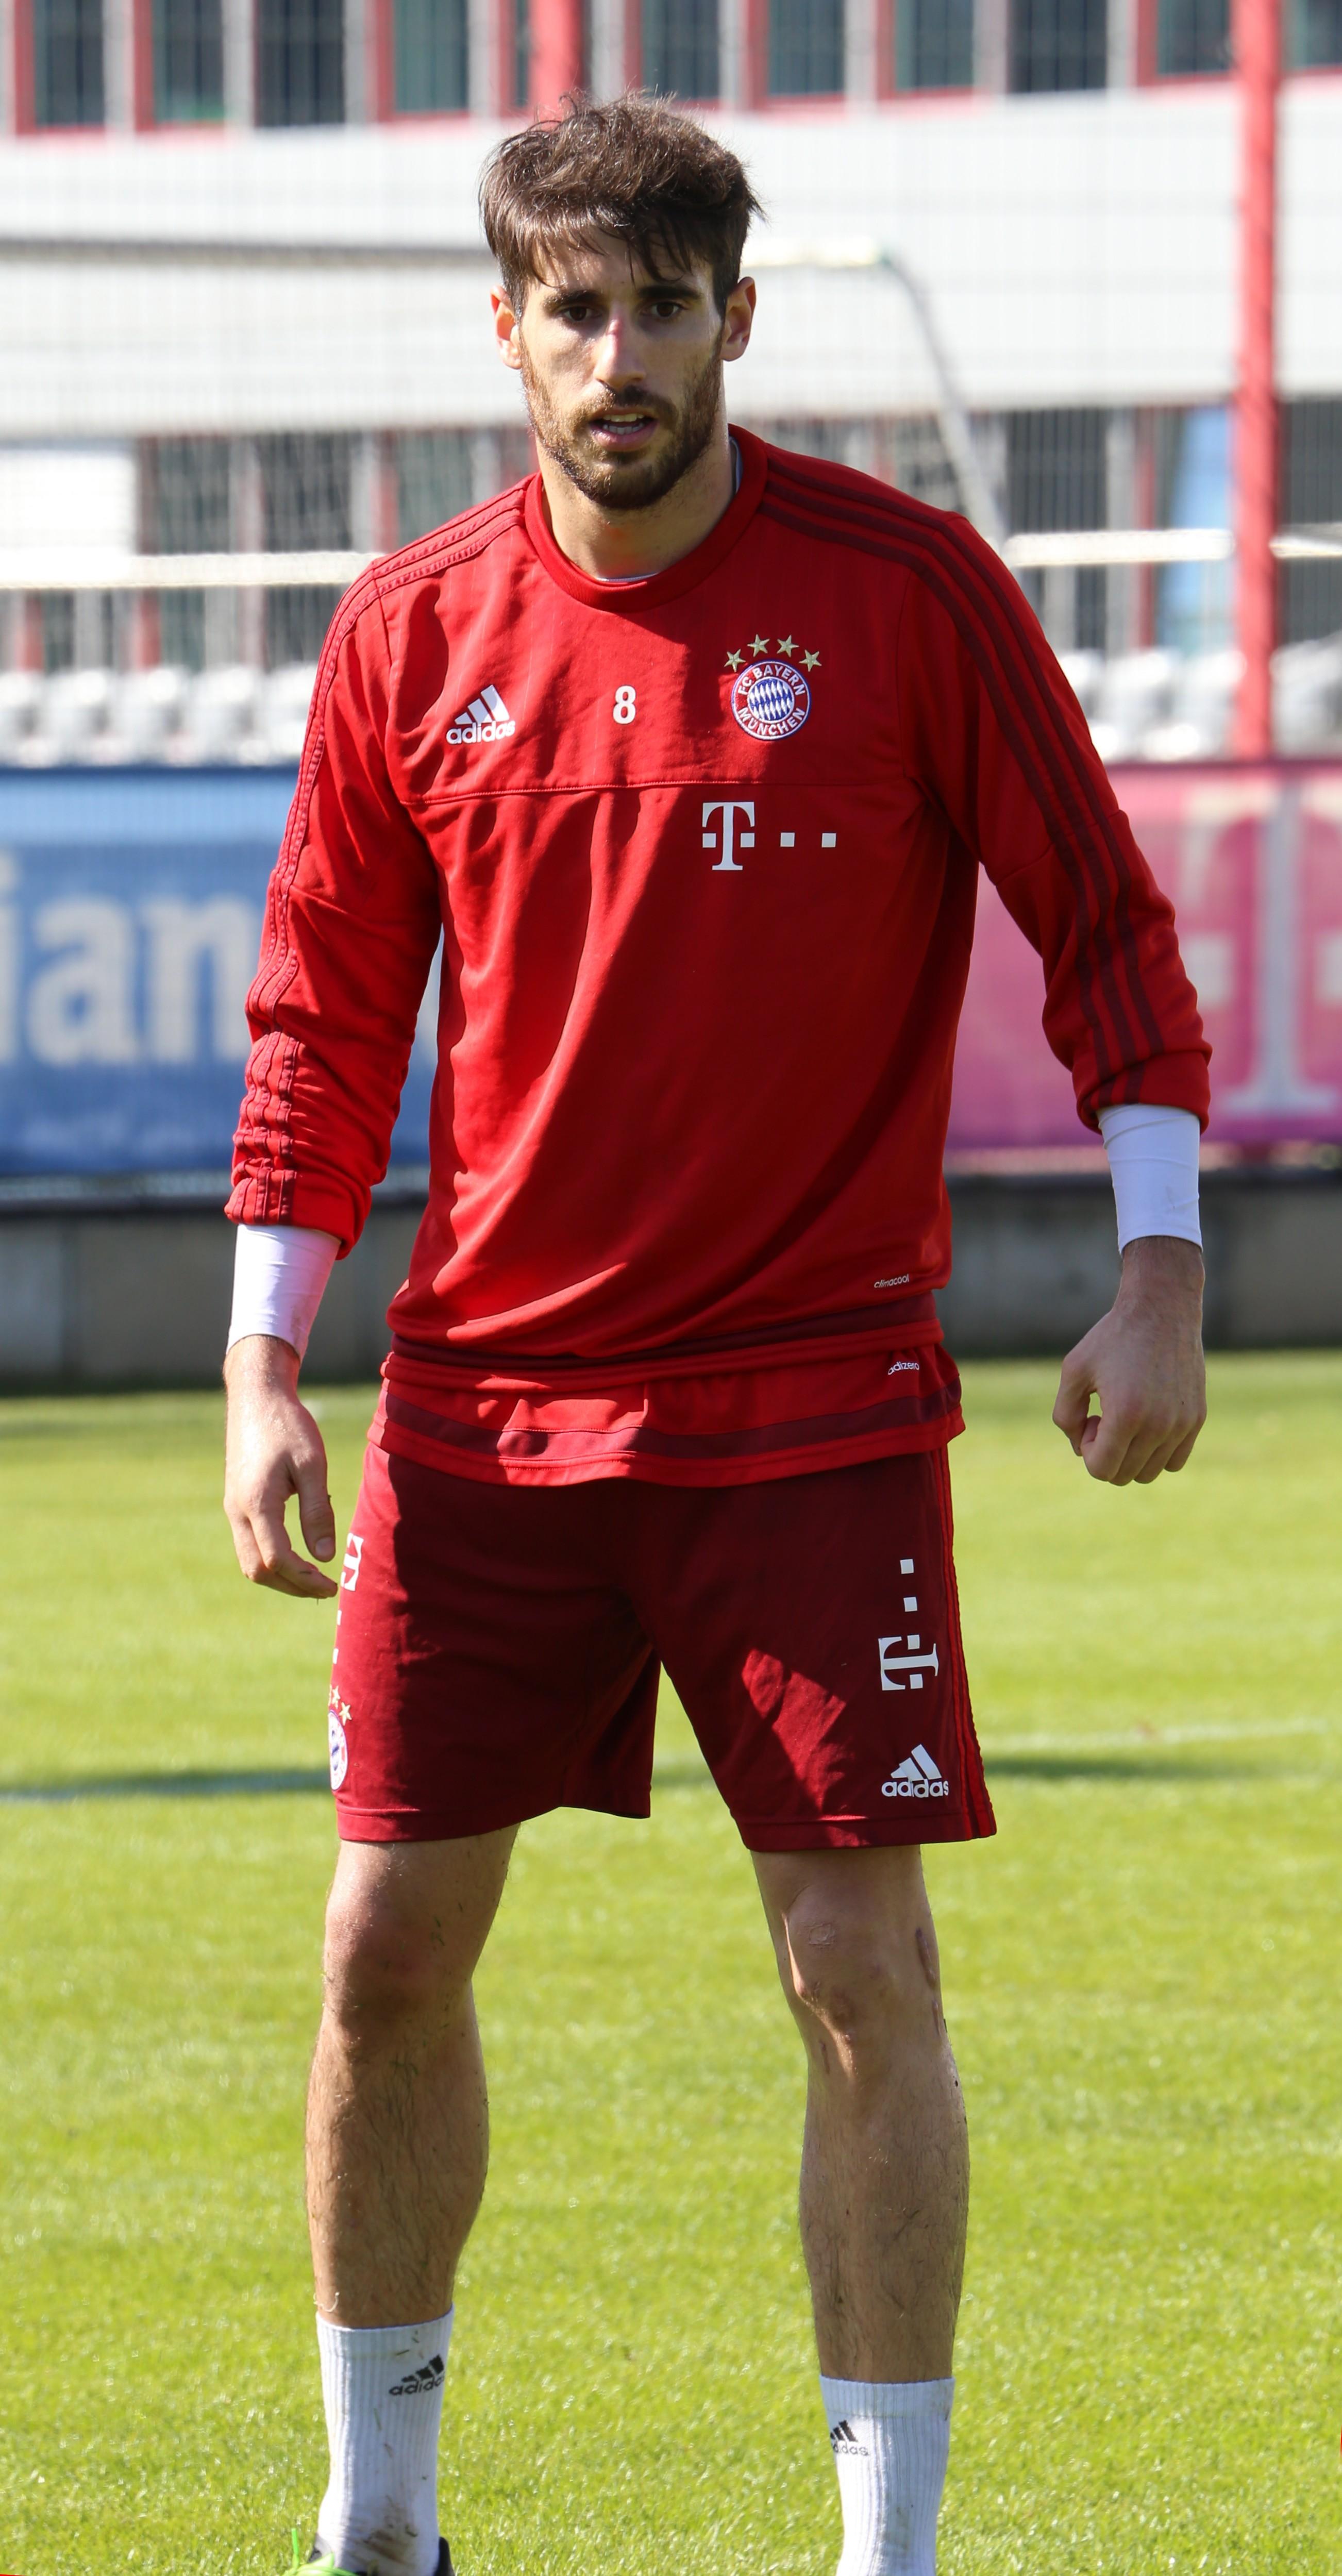 Maglia Home FC Bayern München Leon Goretzka